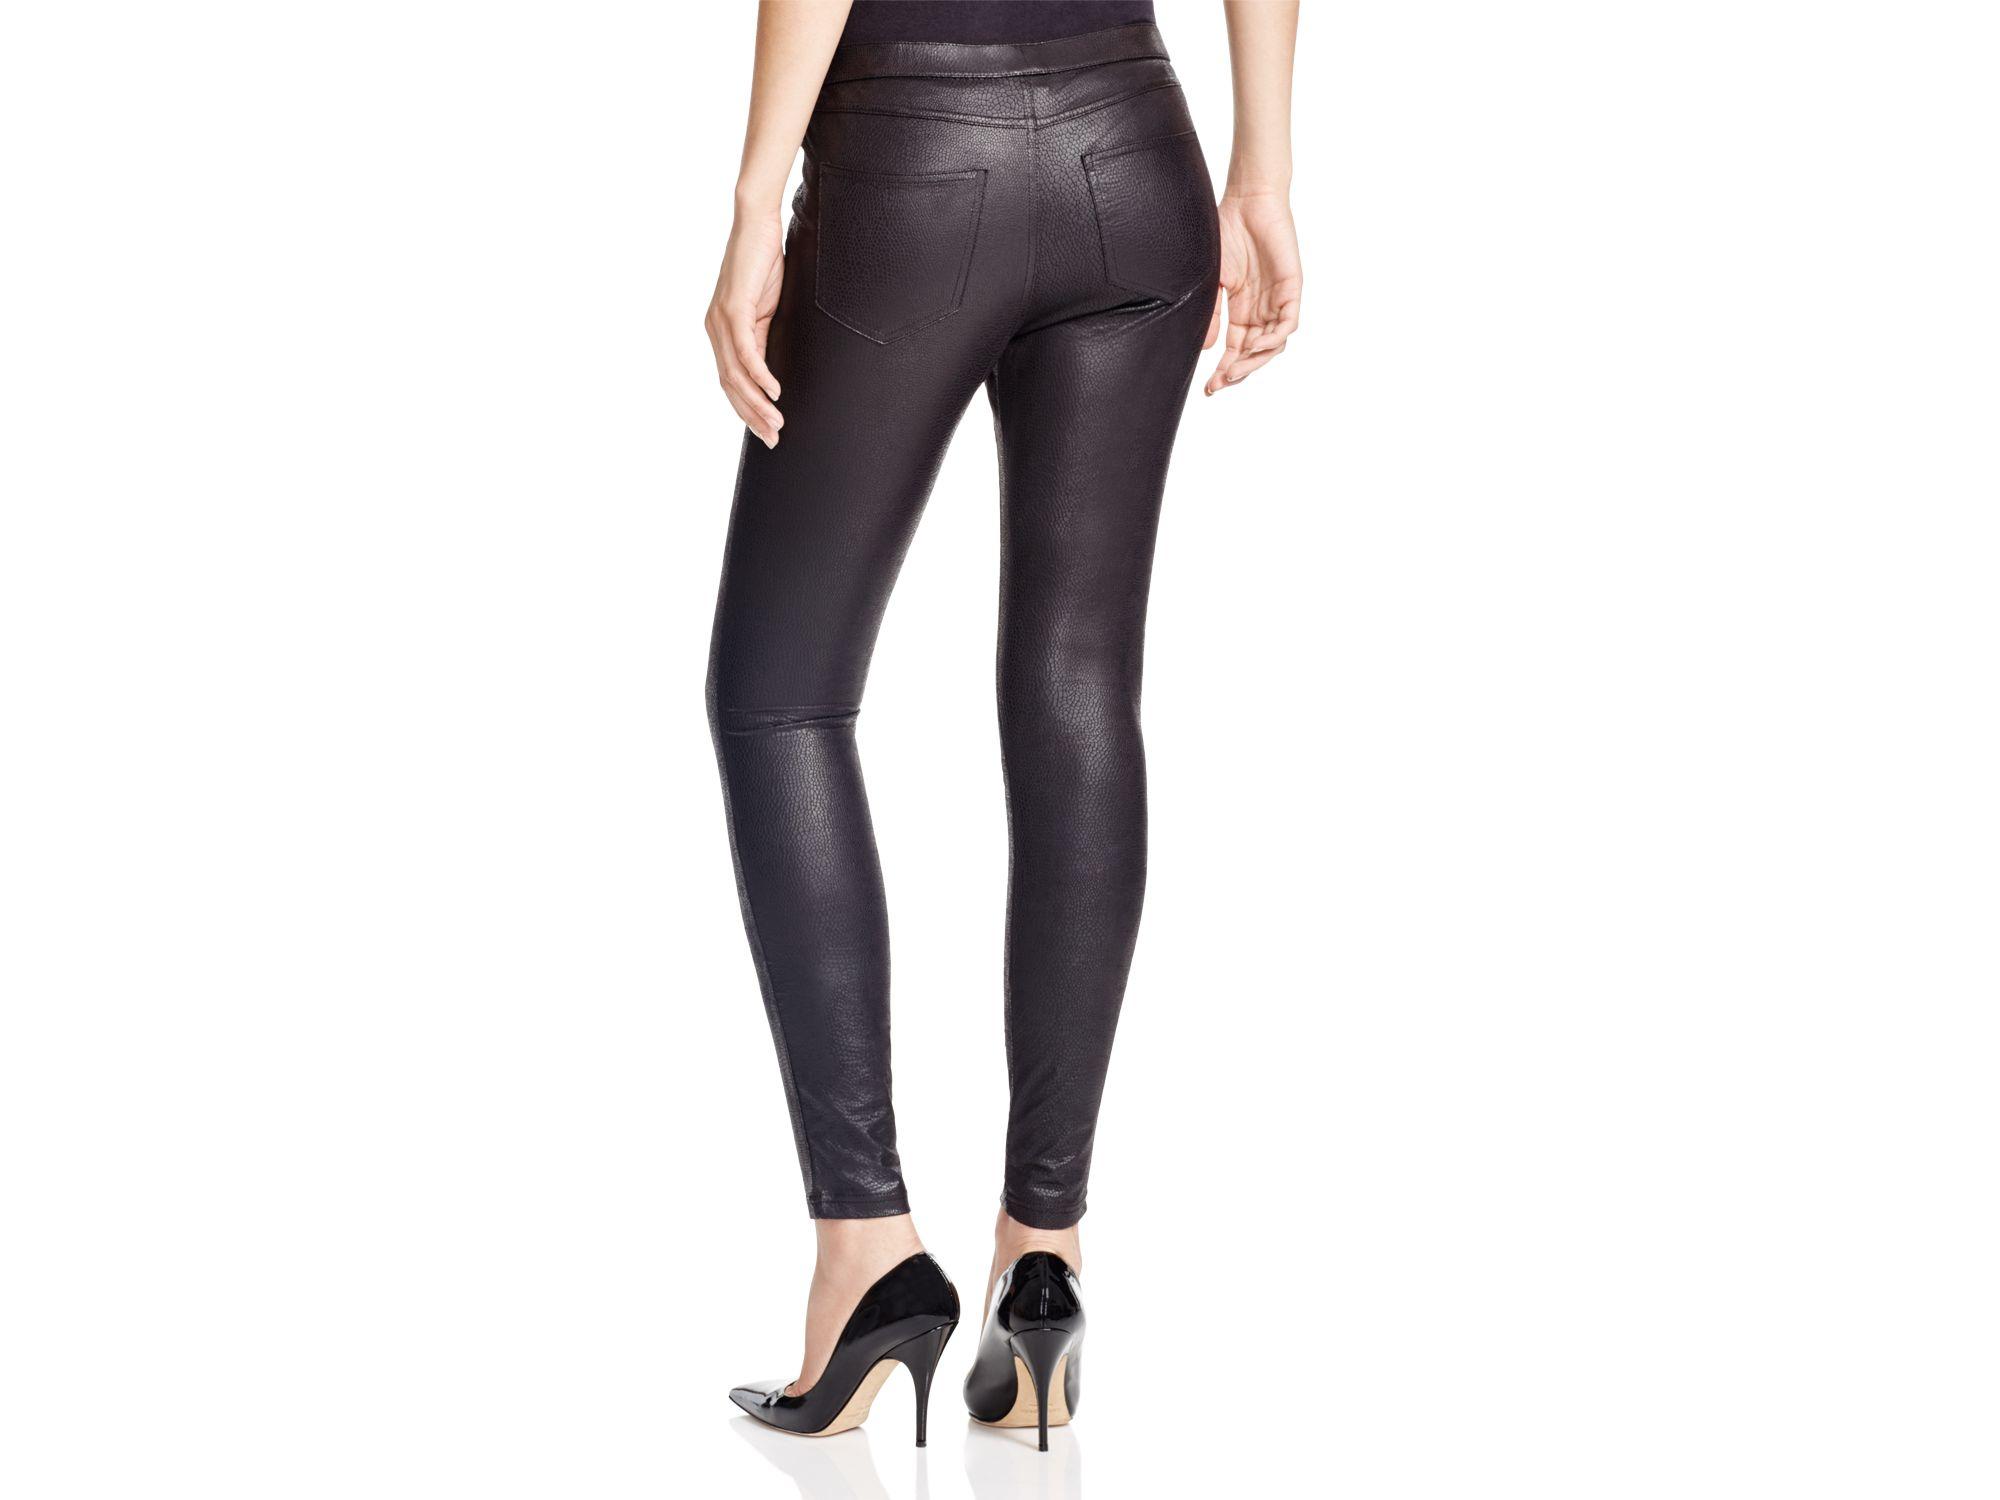 Lyst - Hue Python-embossed Leatherette Leggings in Black